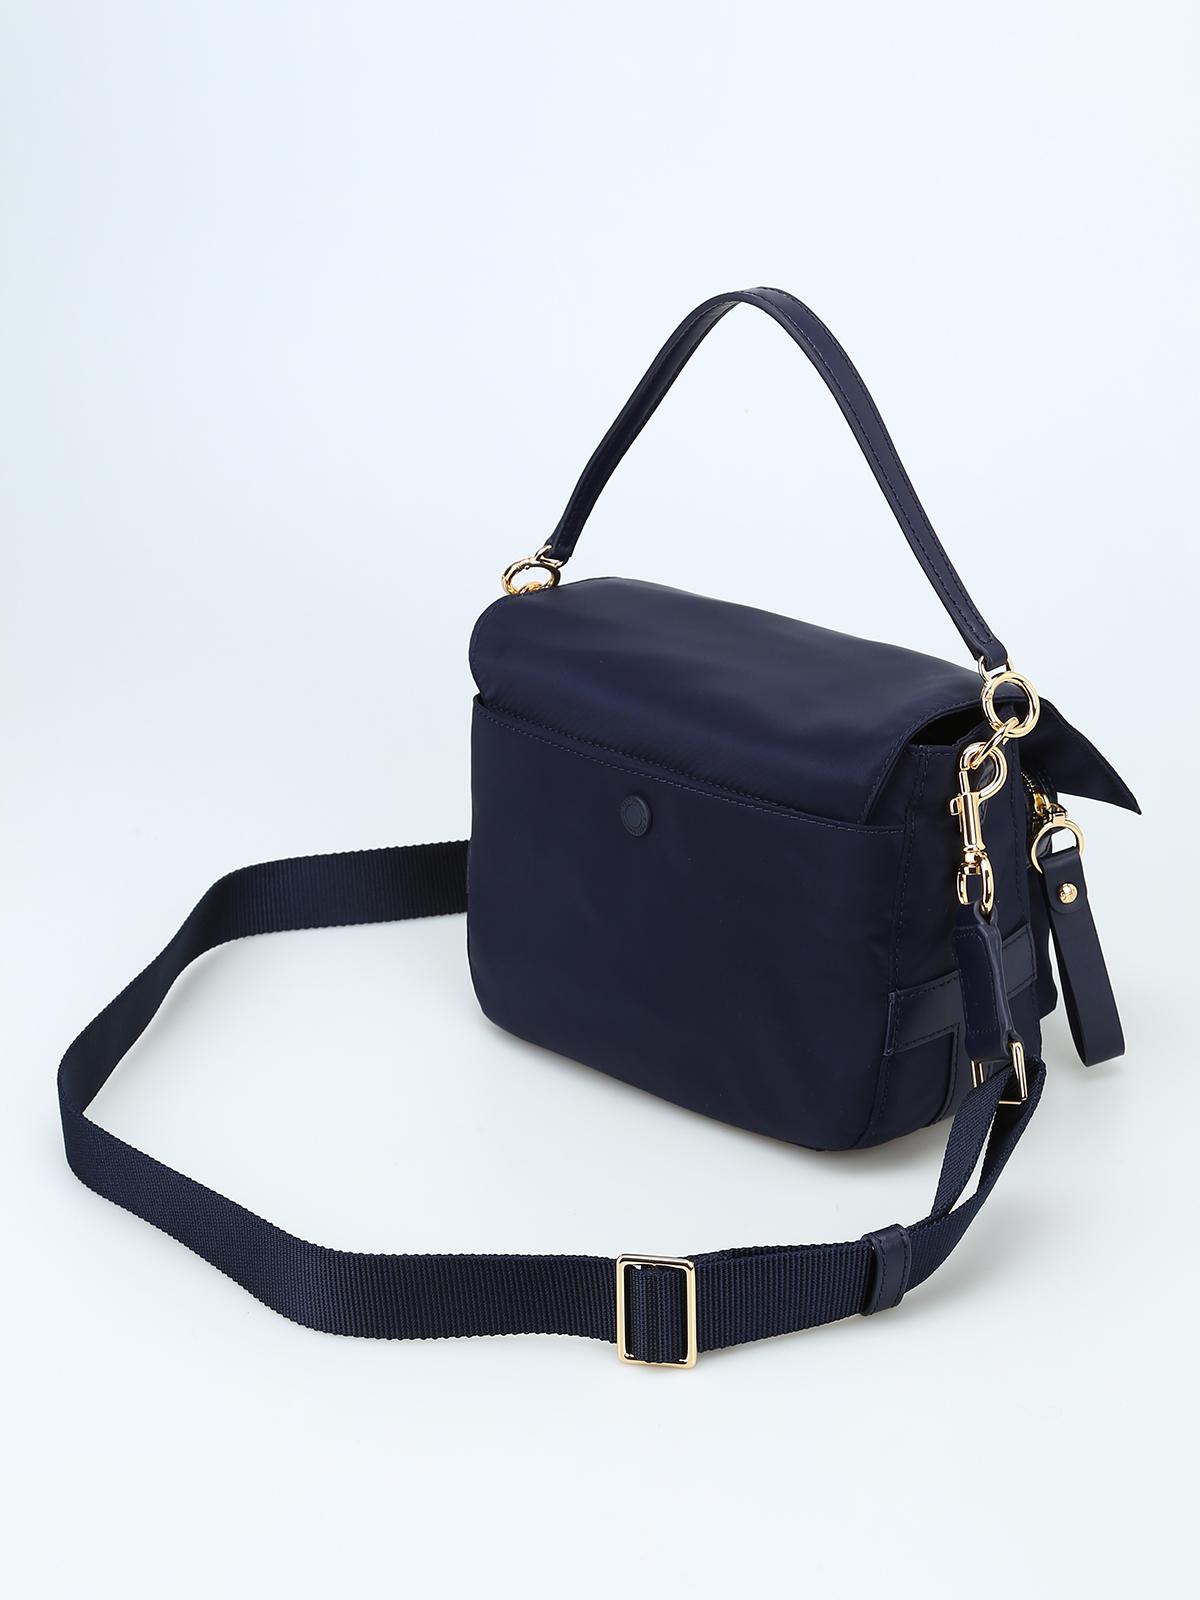 9980ec3c1b7 iKRIX TORY BURCH: cross body bags - Tilda blue nylon cross body bag